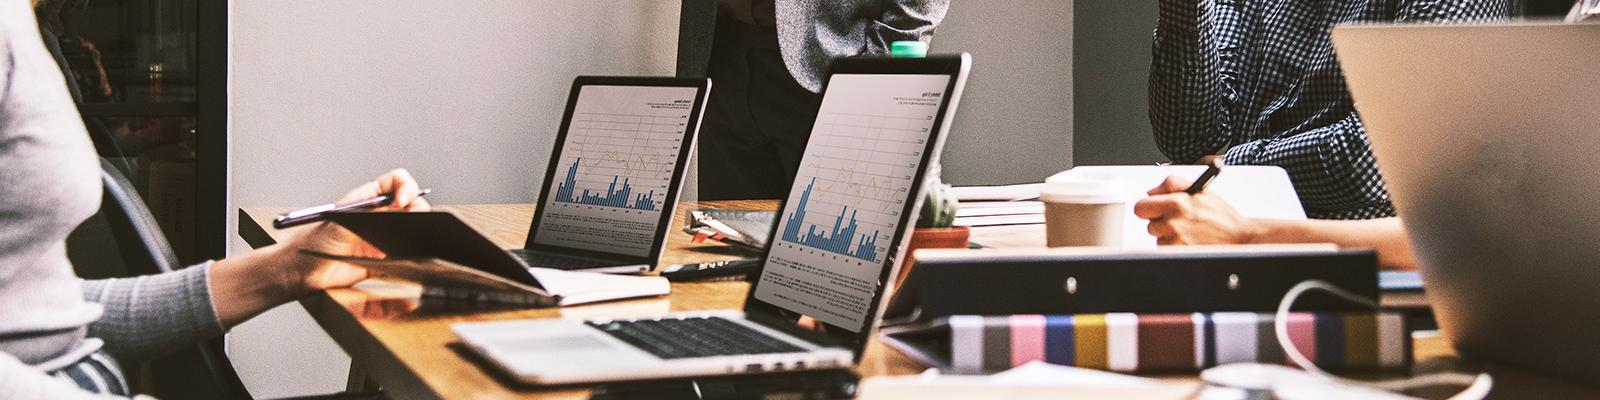 investment management data on laptop